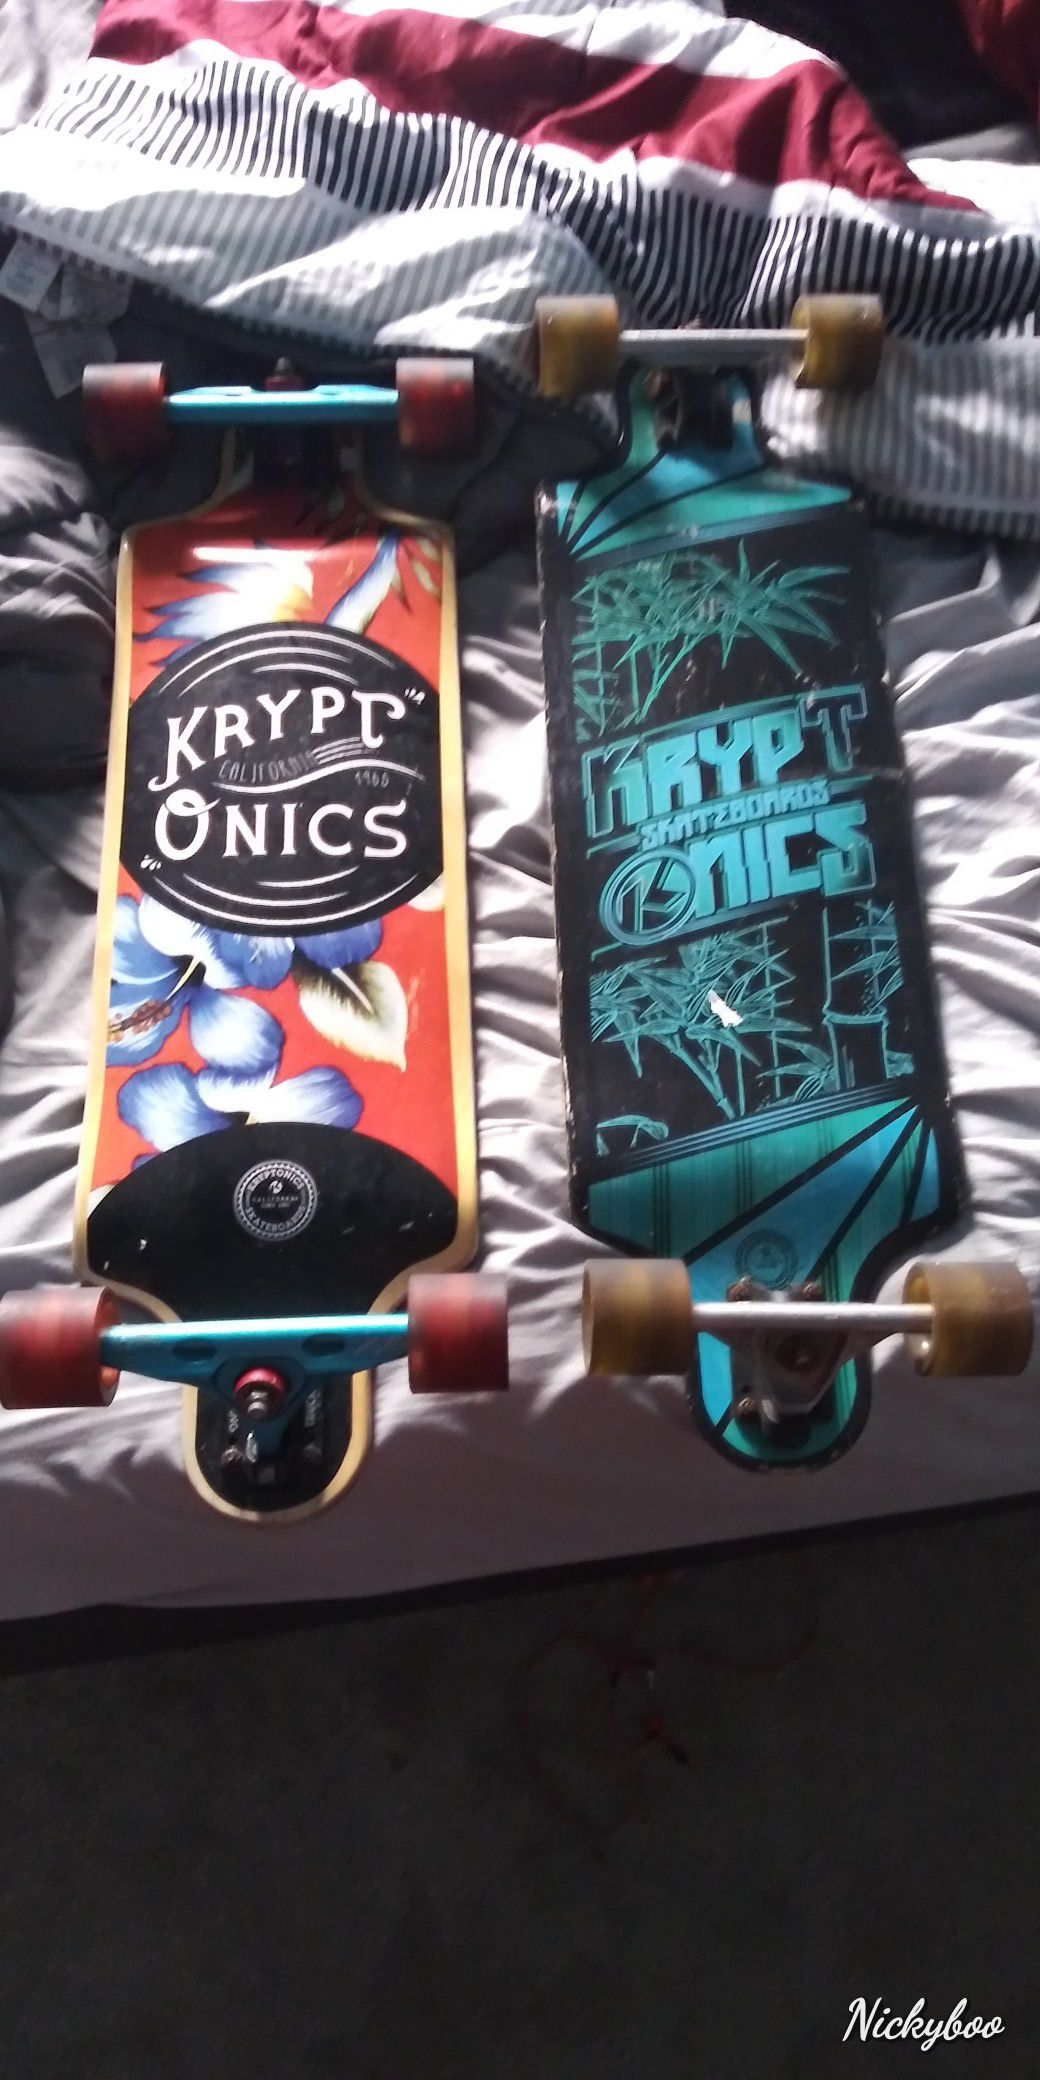 I'm selling 3 skate boards for $ 180